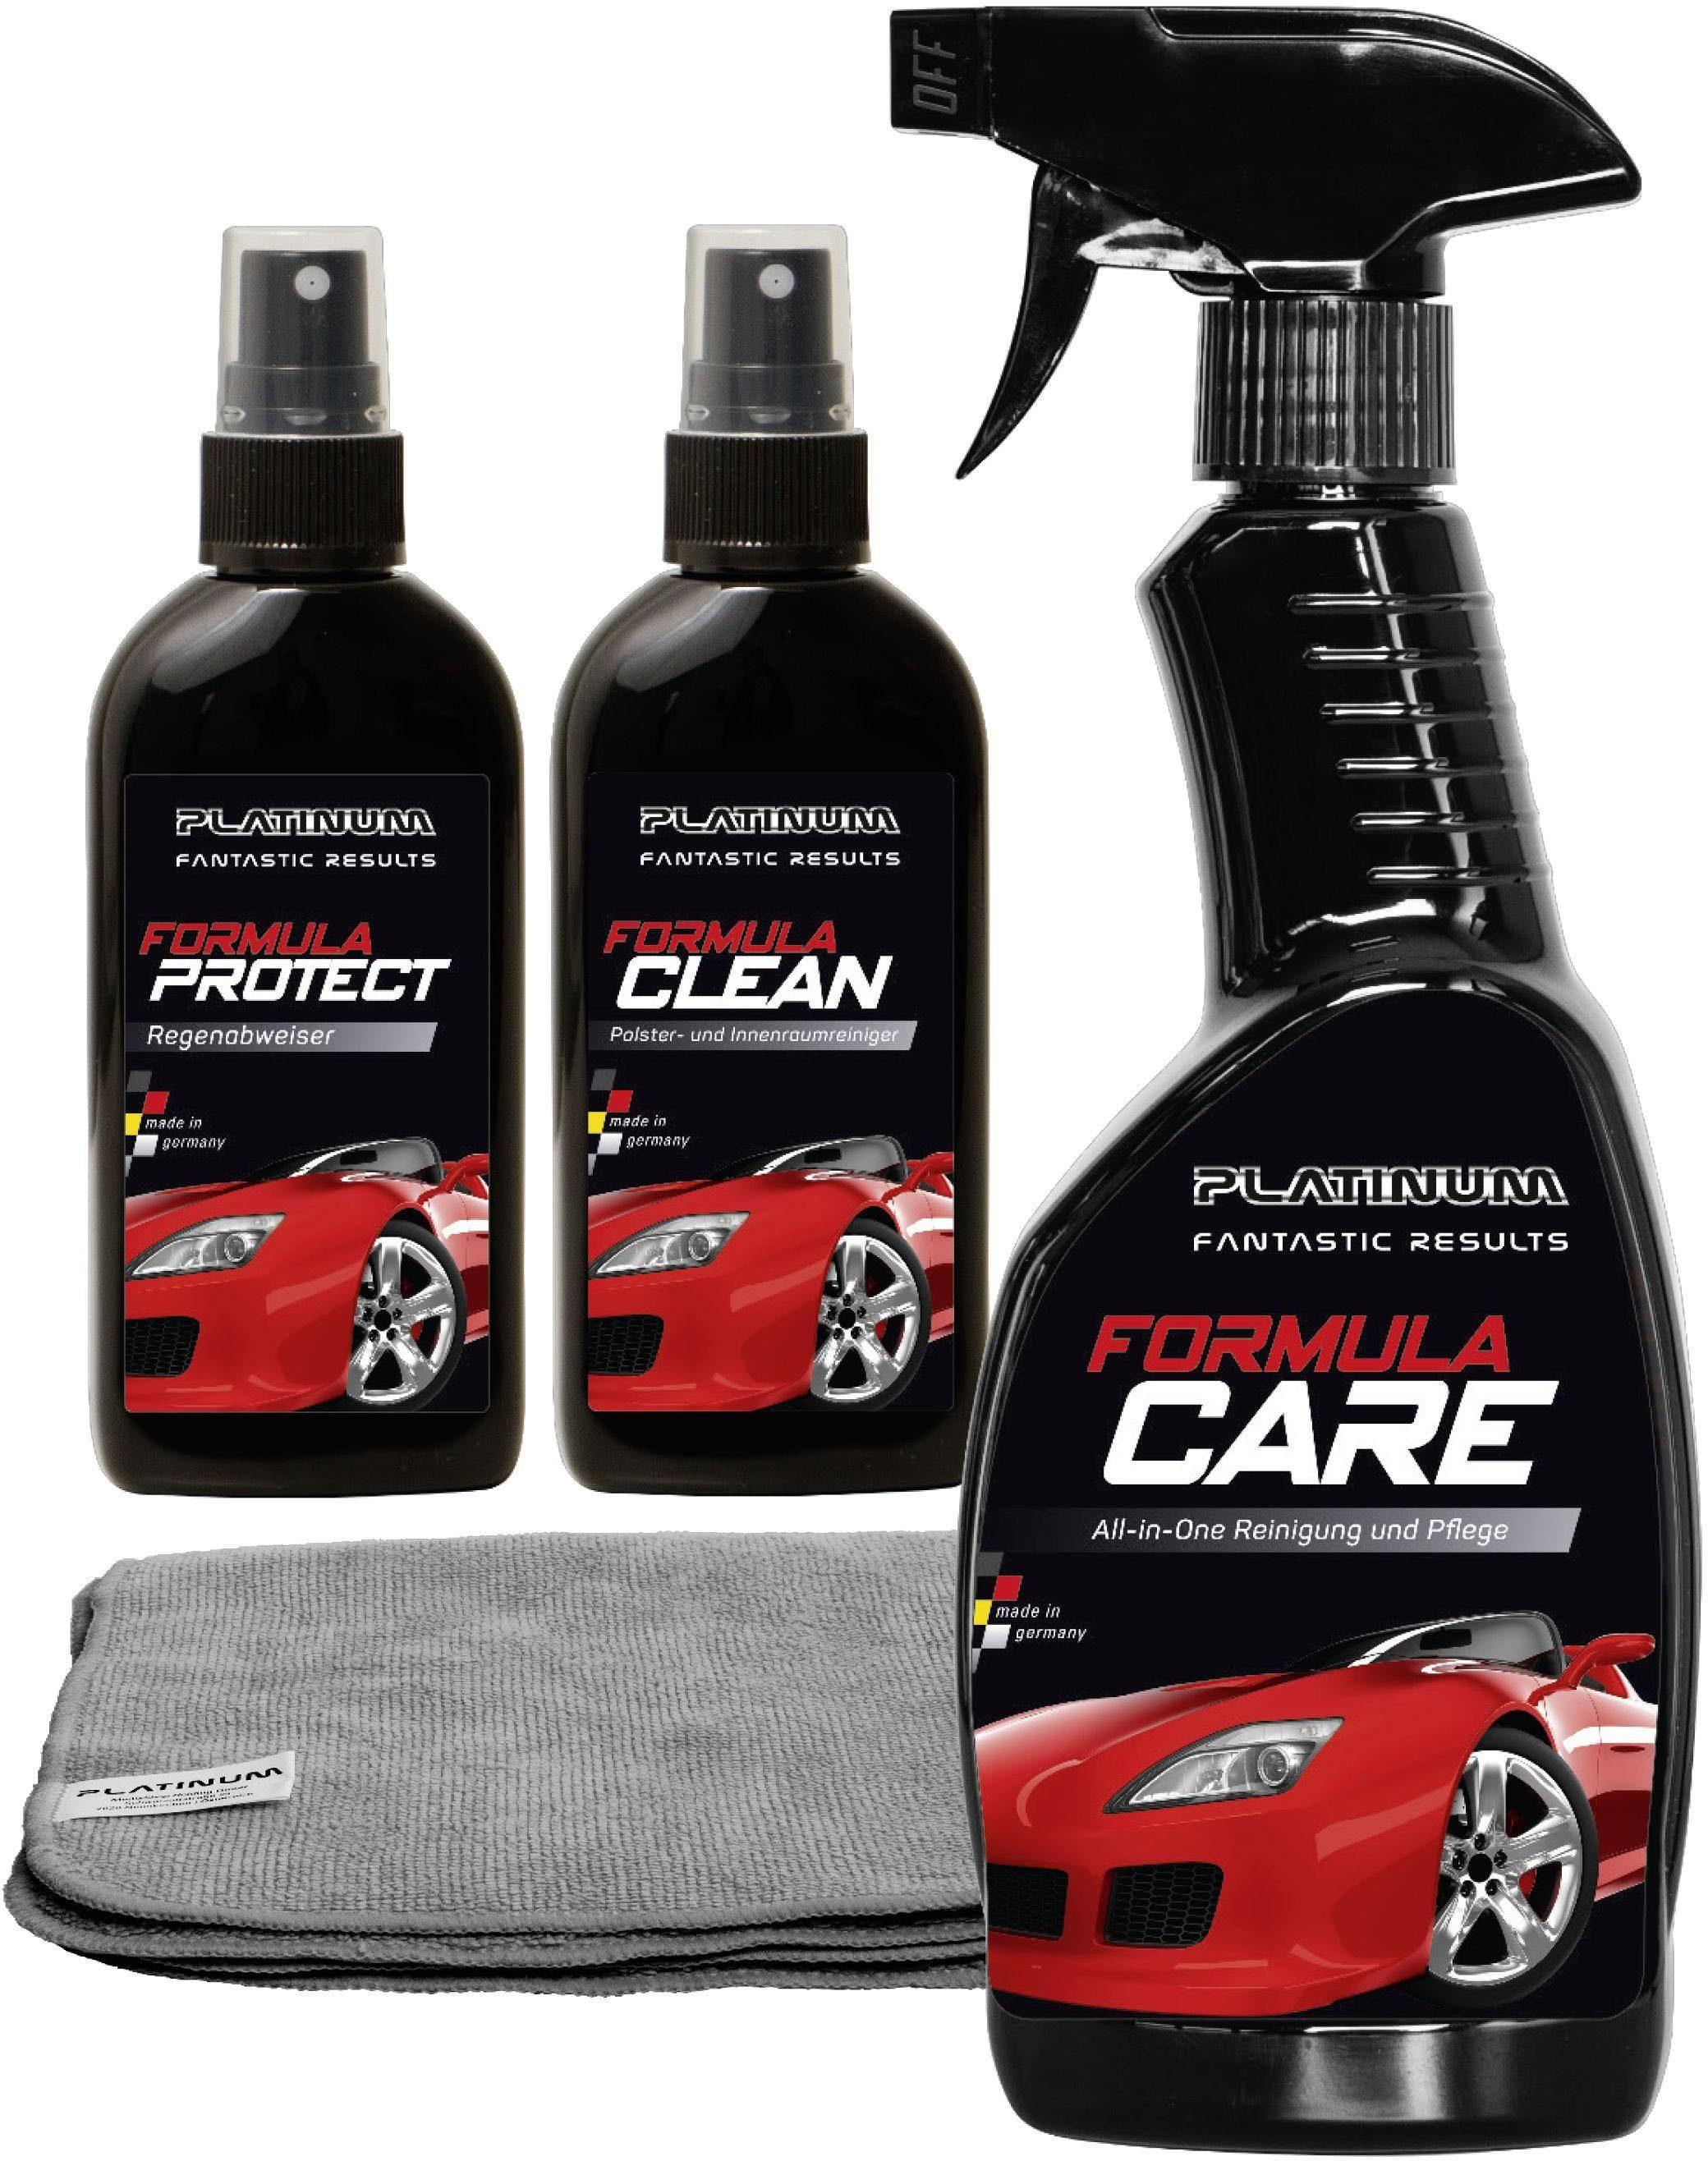 Auto Pflegeset, »Platinum Fantastic Results Doppelset«